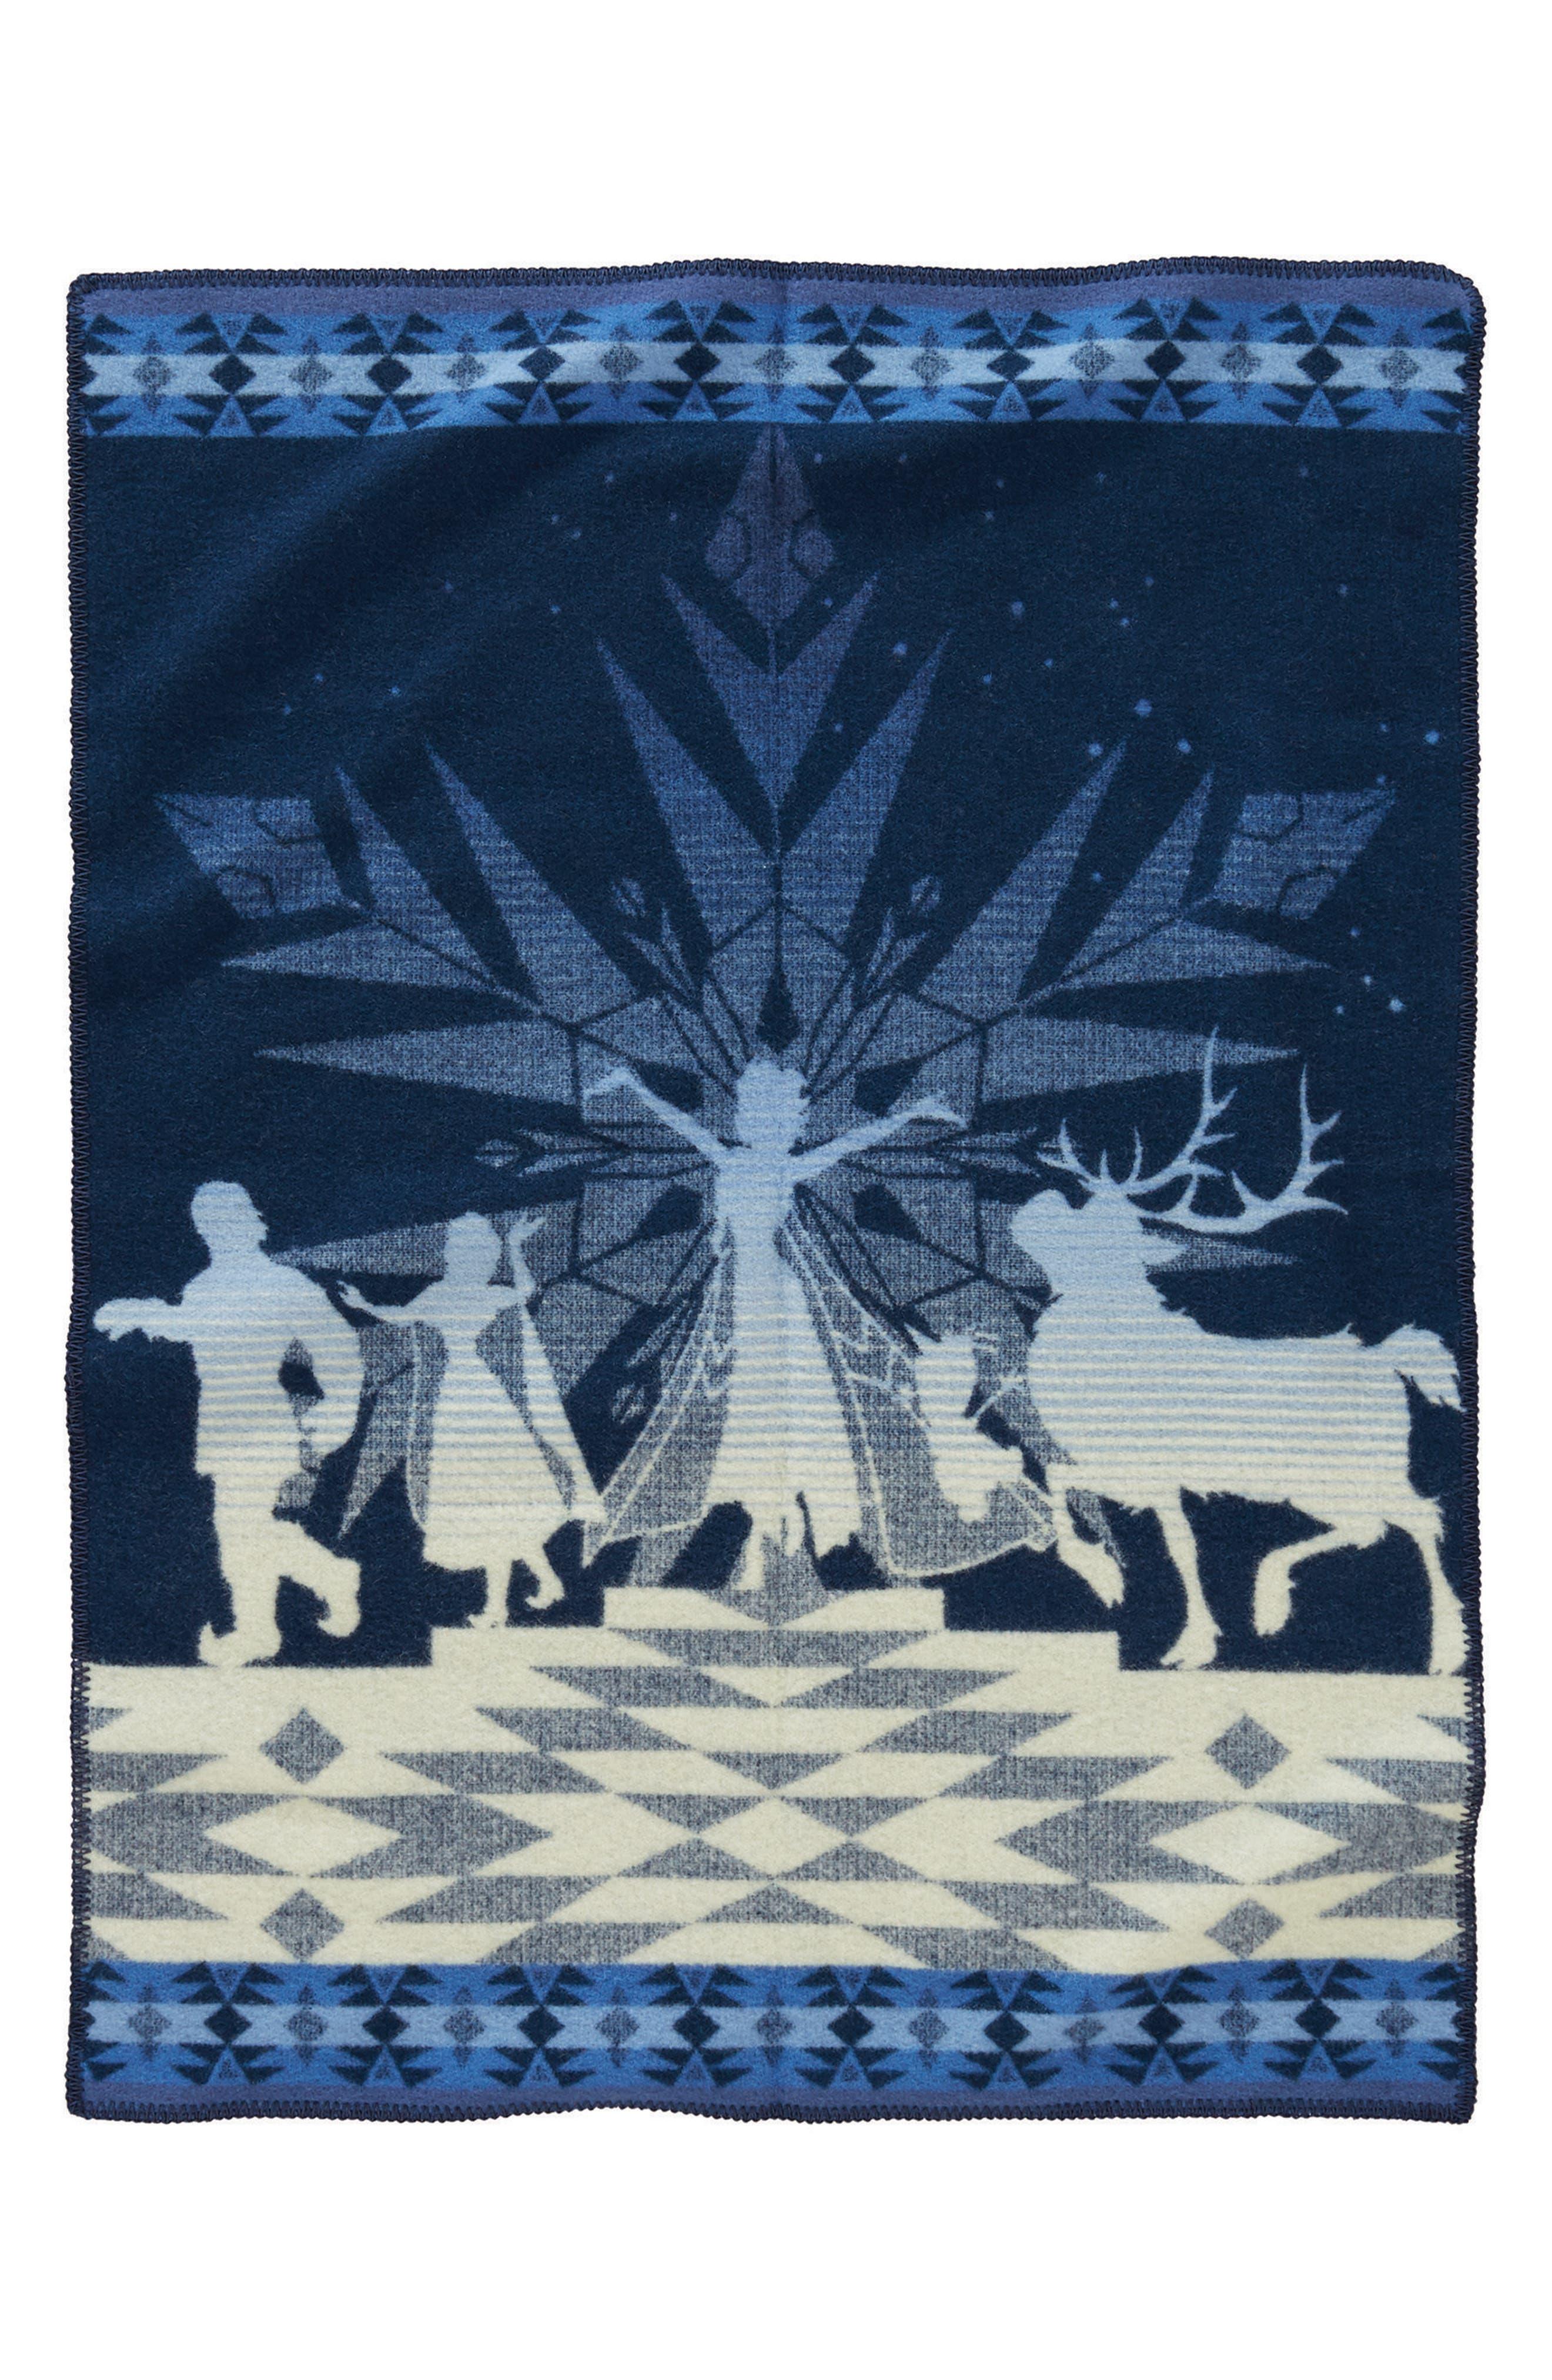 Disney 'Frozen' Friendship Blanket,                             Main thumbnail 1, color,                             Navy